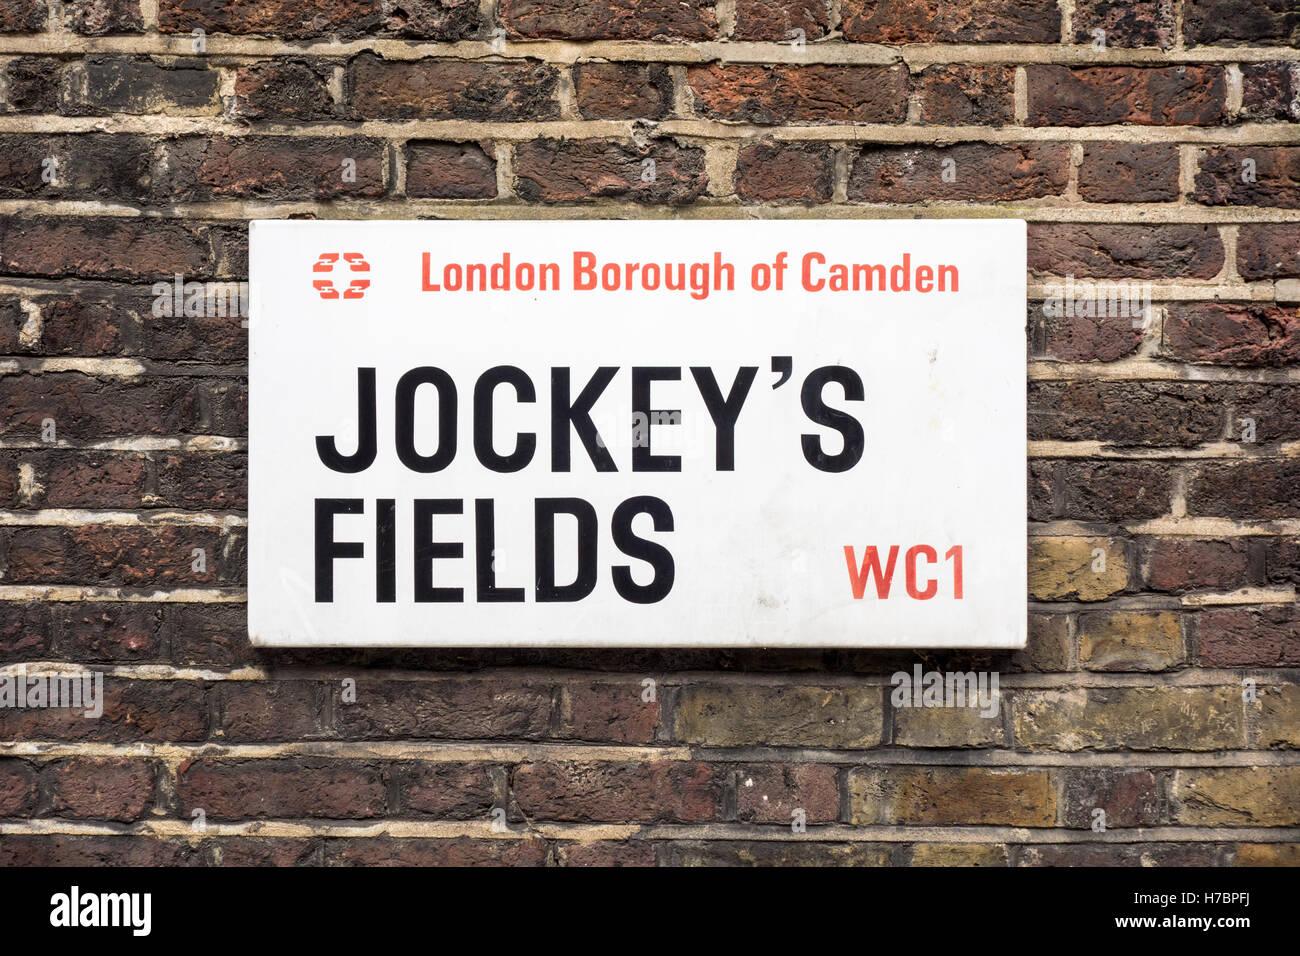 Jockeys Field's, Holborn, London, UK - Stock Image